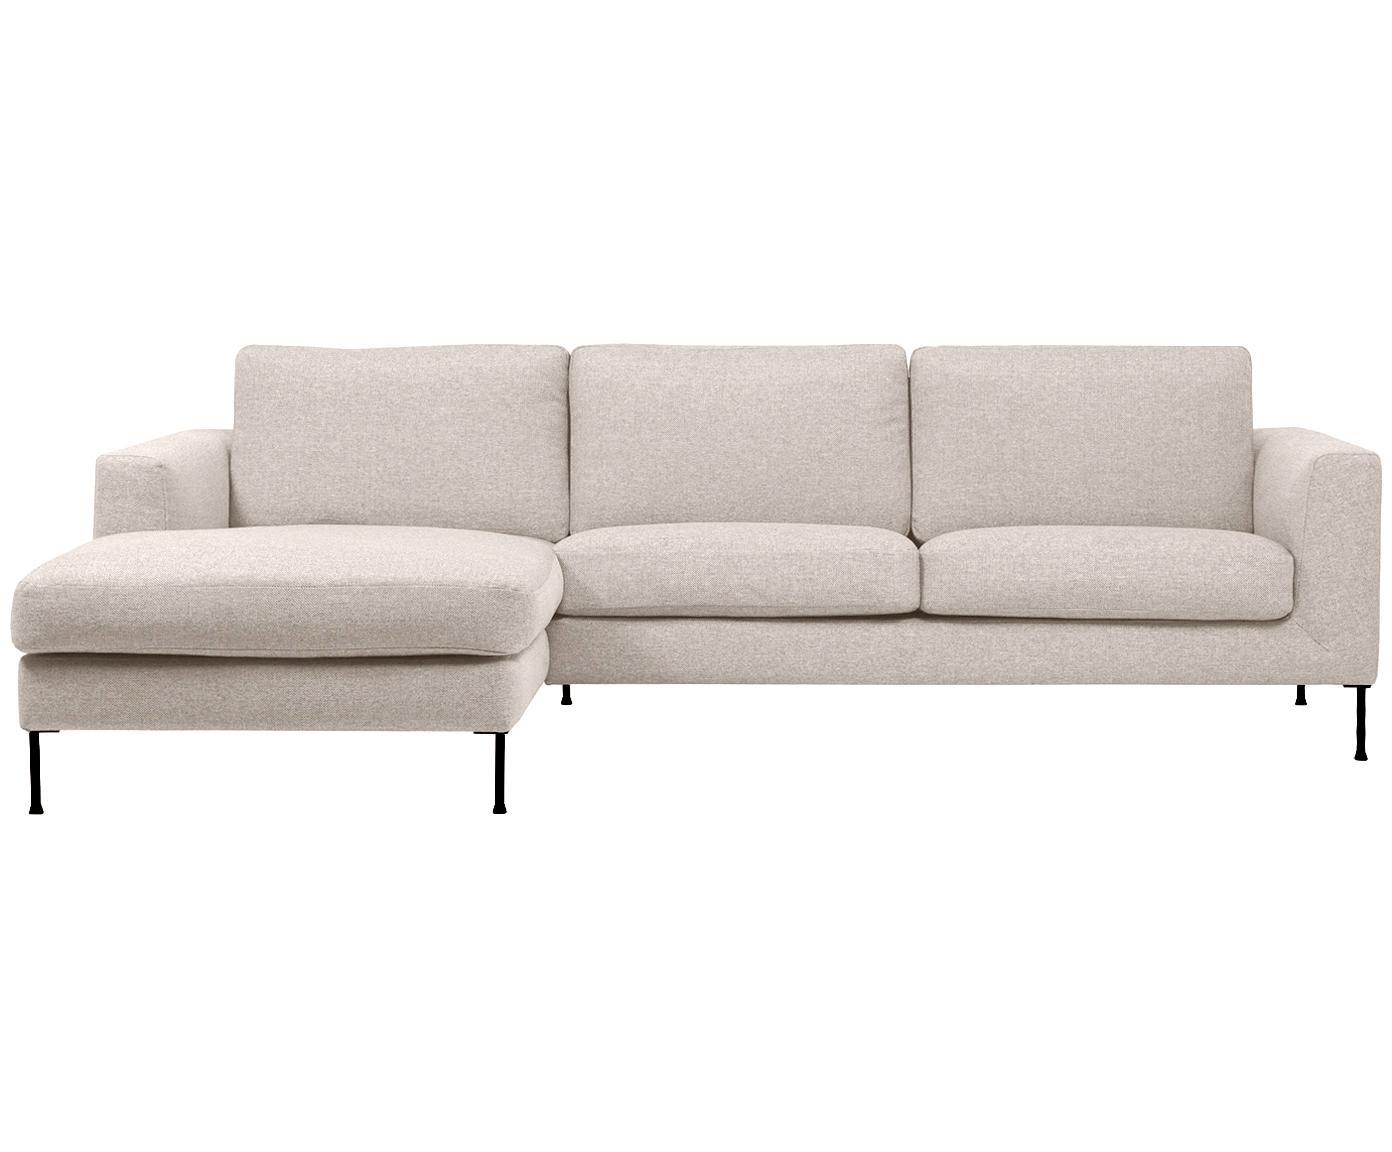 Hoekbank Cucita (3-zits), Bekleding: geweven stof (polyester), Frame: massief grenenhout, Poten: gelakt metaal, Beige, B 262 x D 163 cm